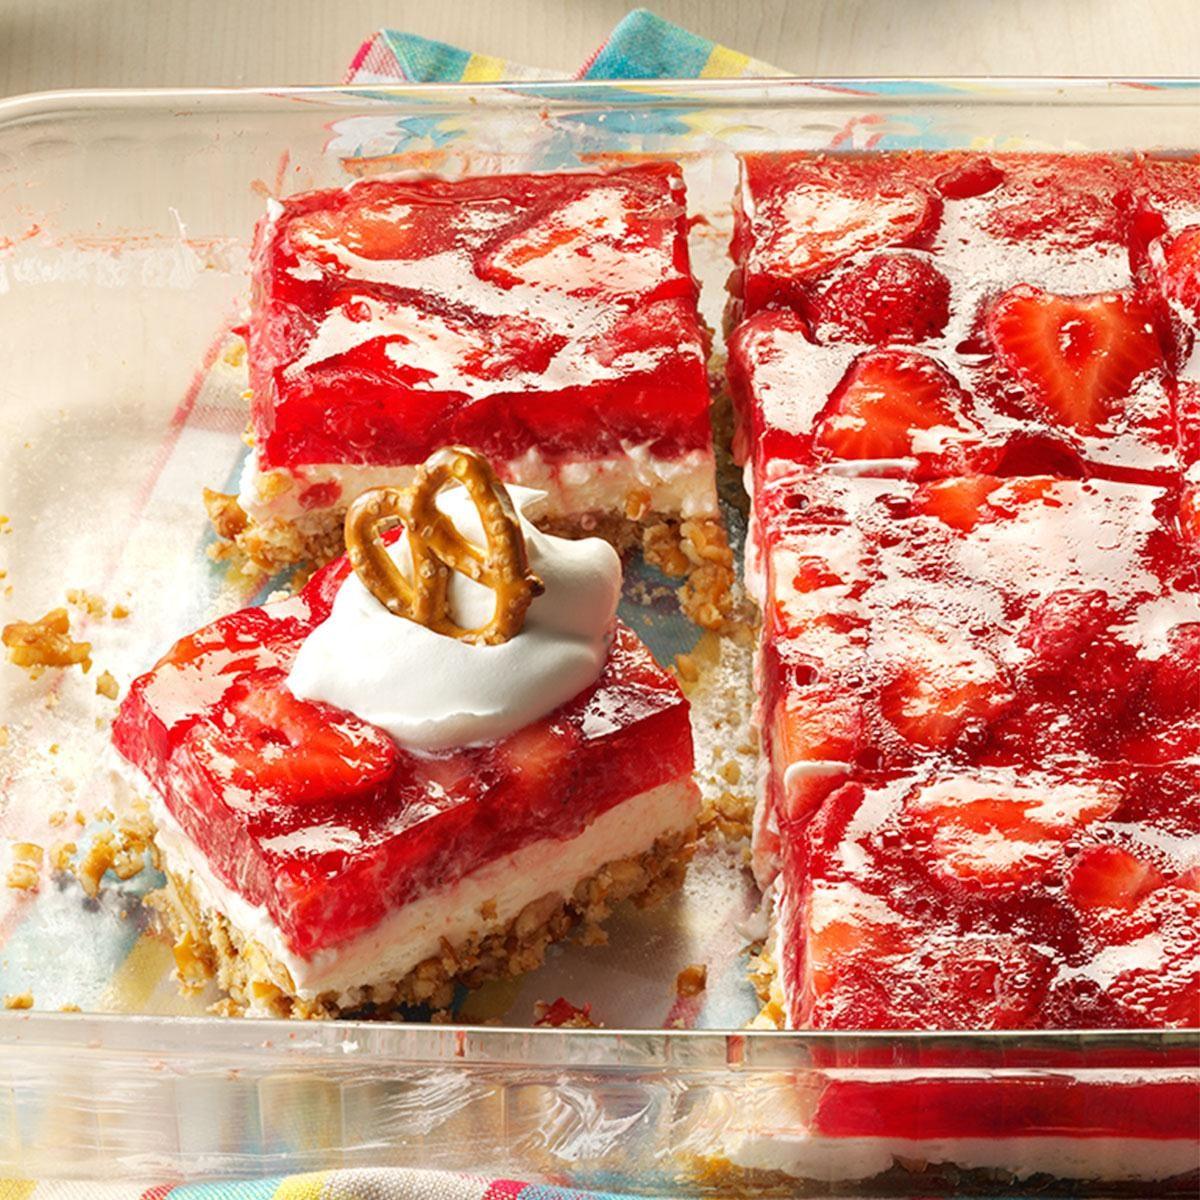 Strawberry Pretzel Dessert Recipe